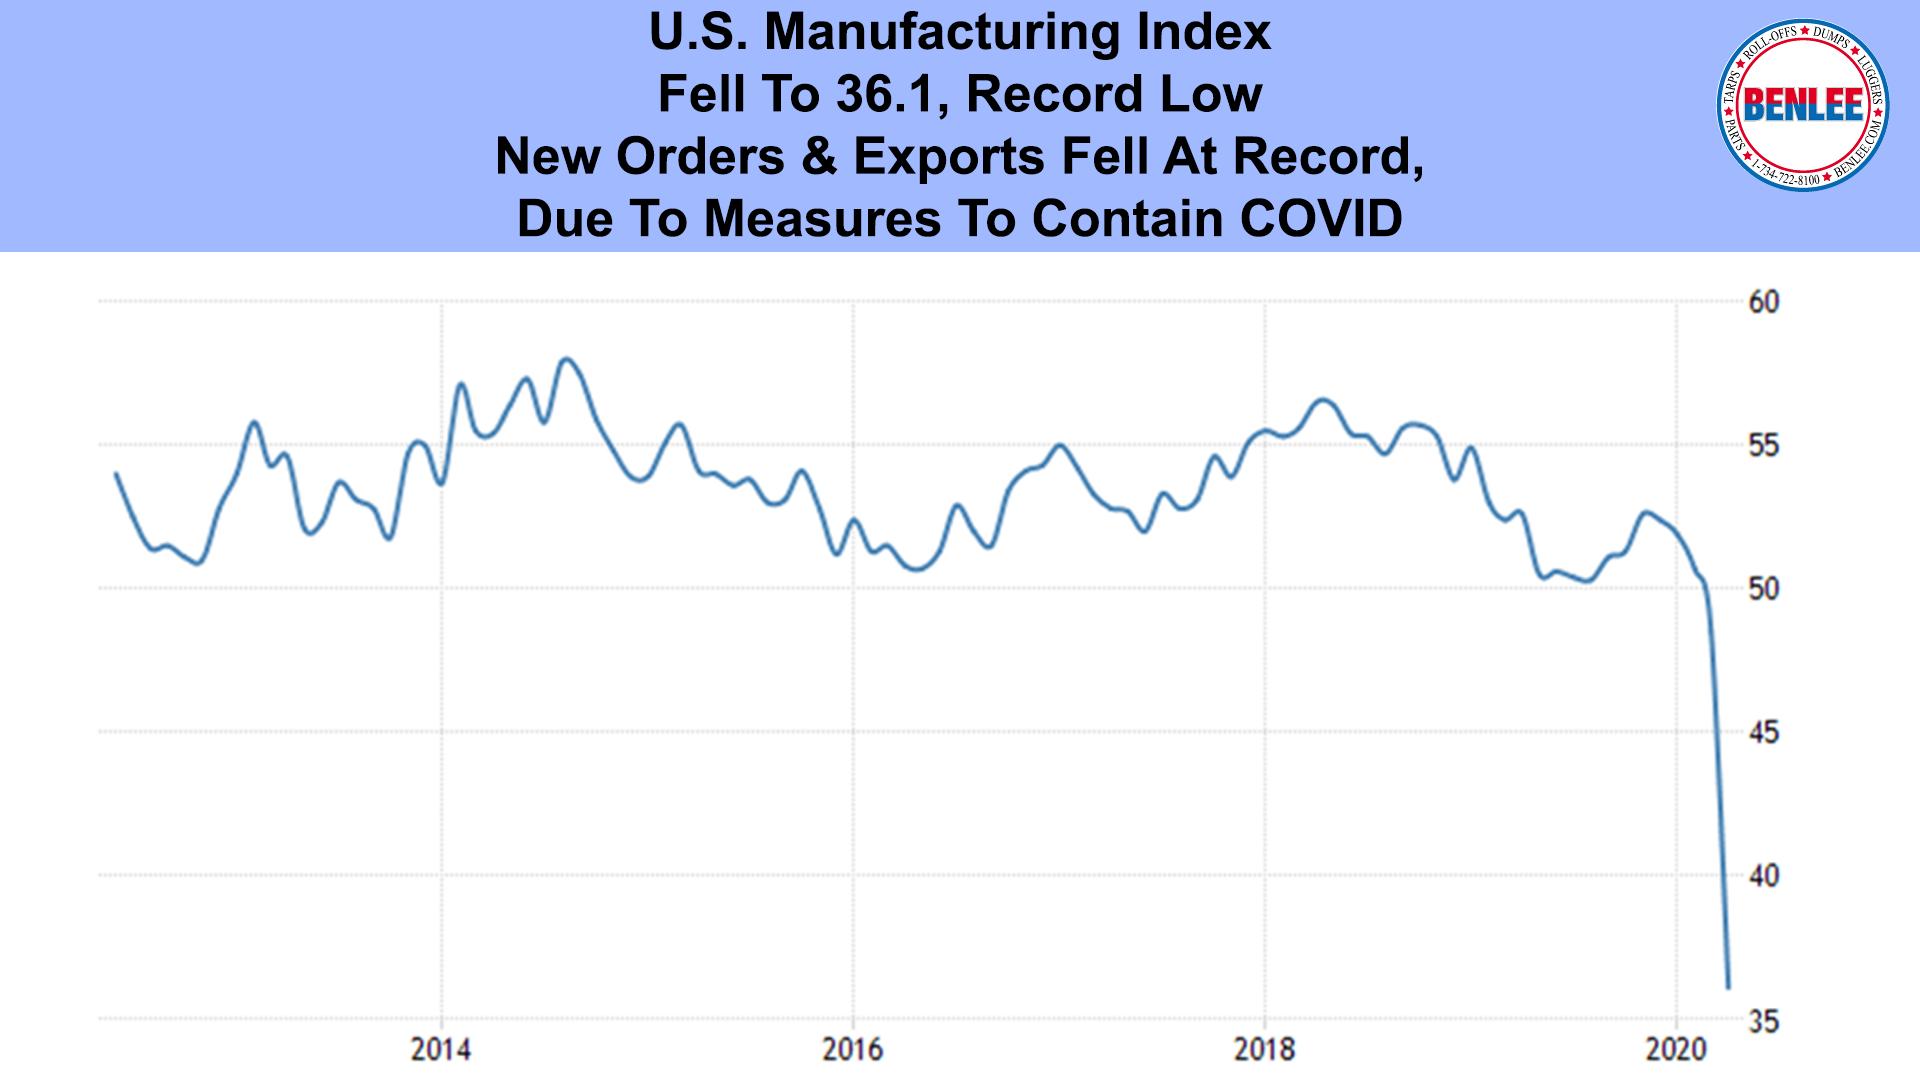 U.S. Manufacturing Index